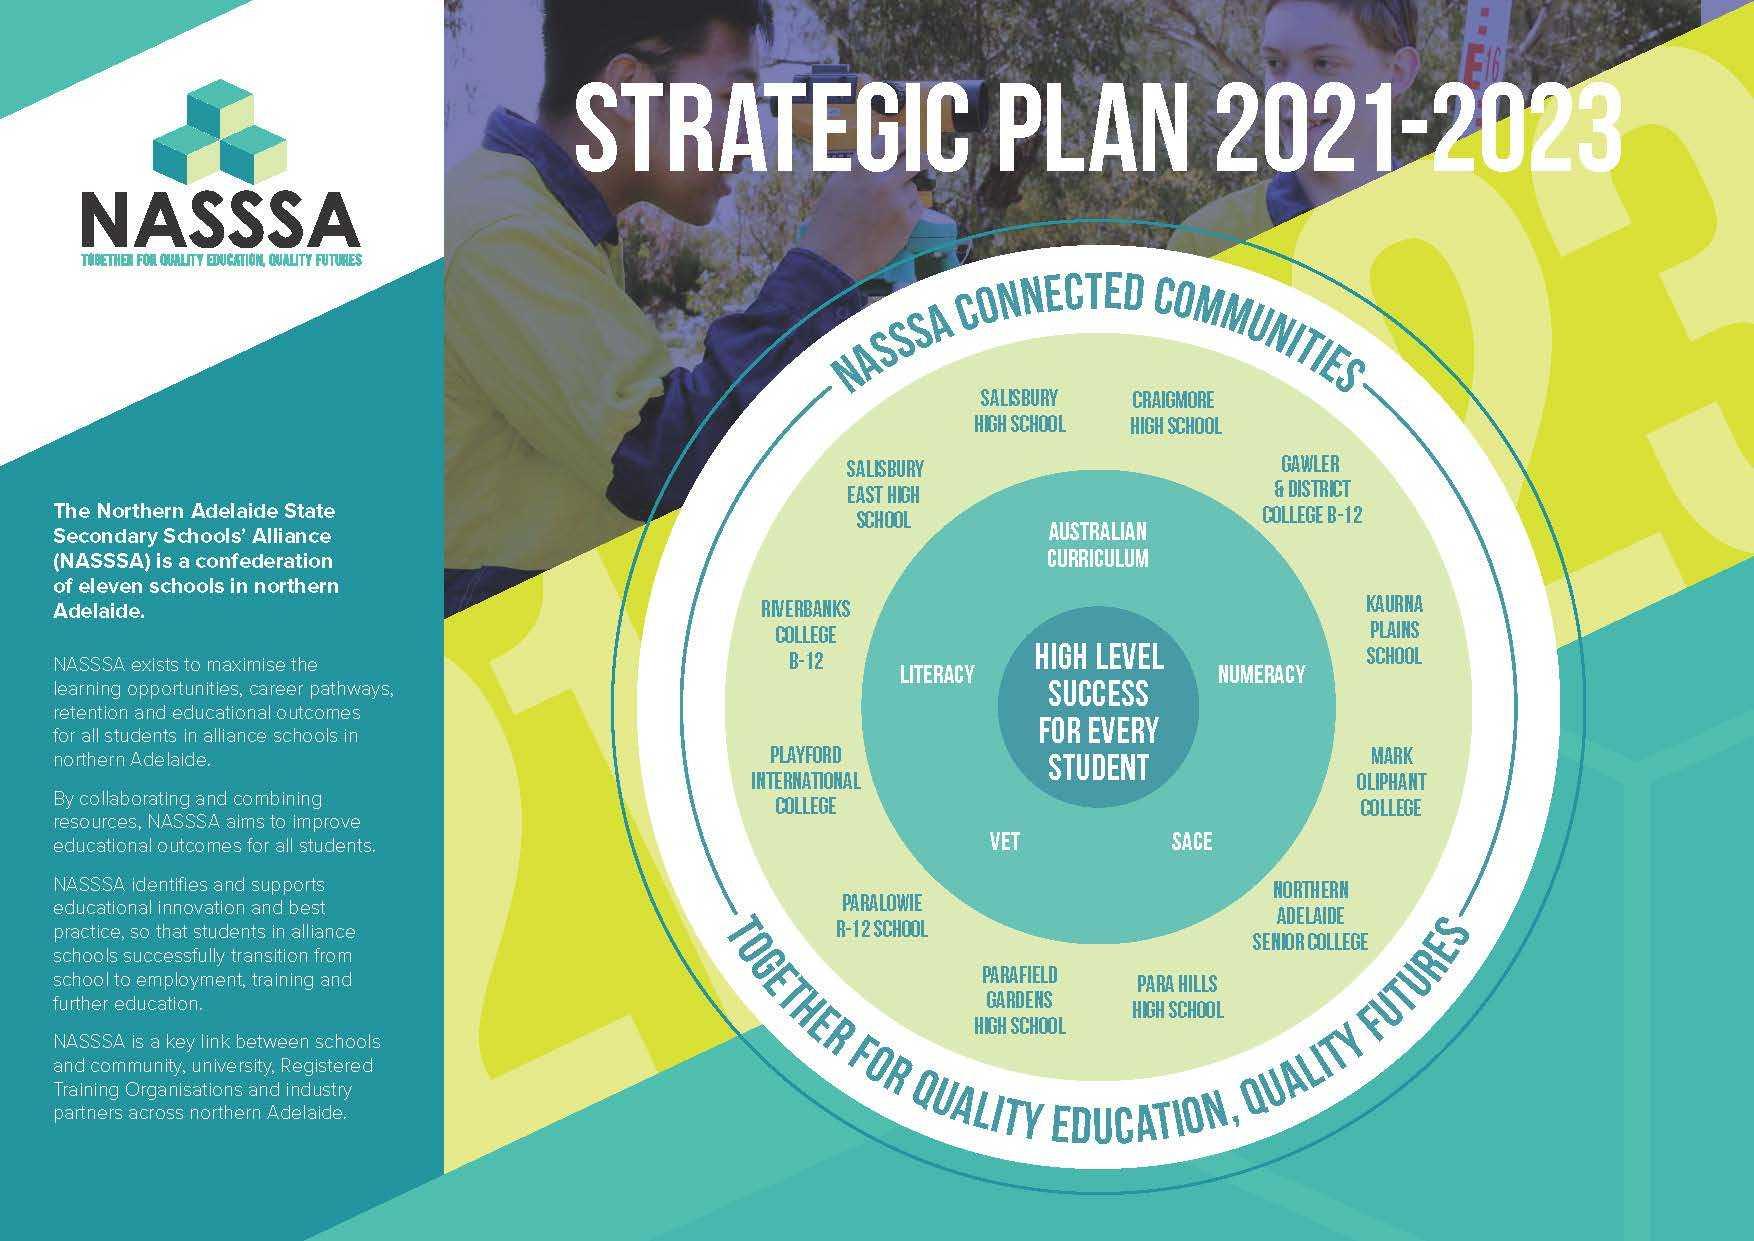 NASSSA Strategic Plan 2021-2023